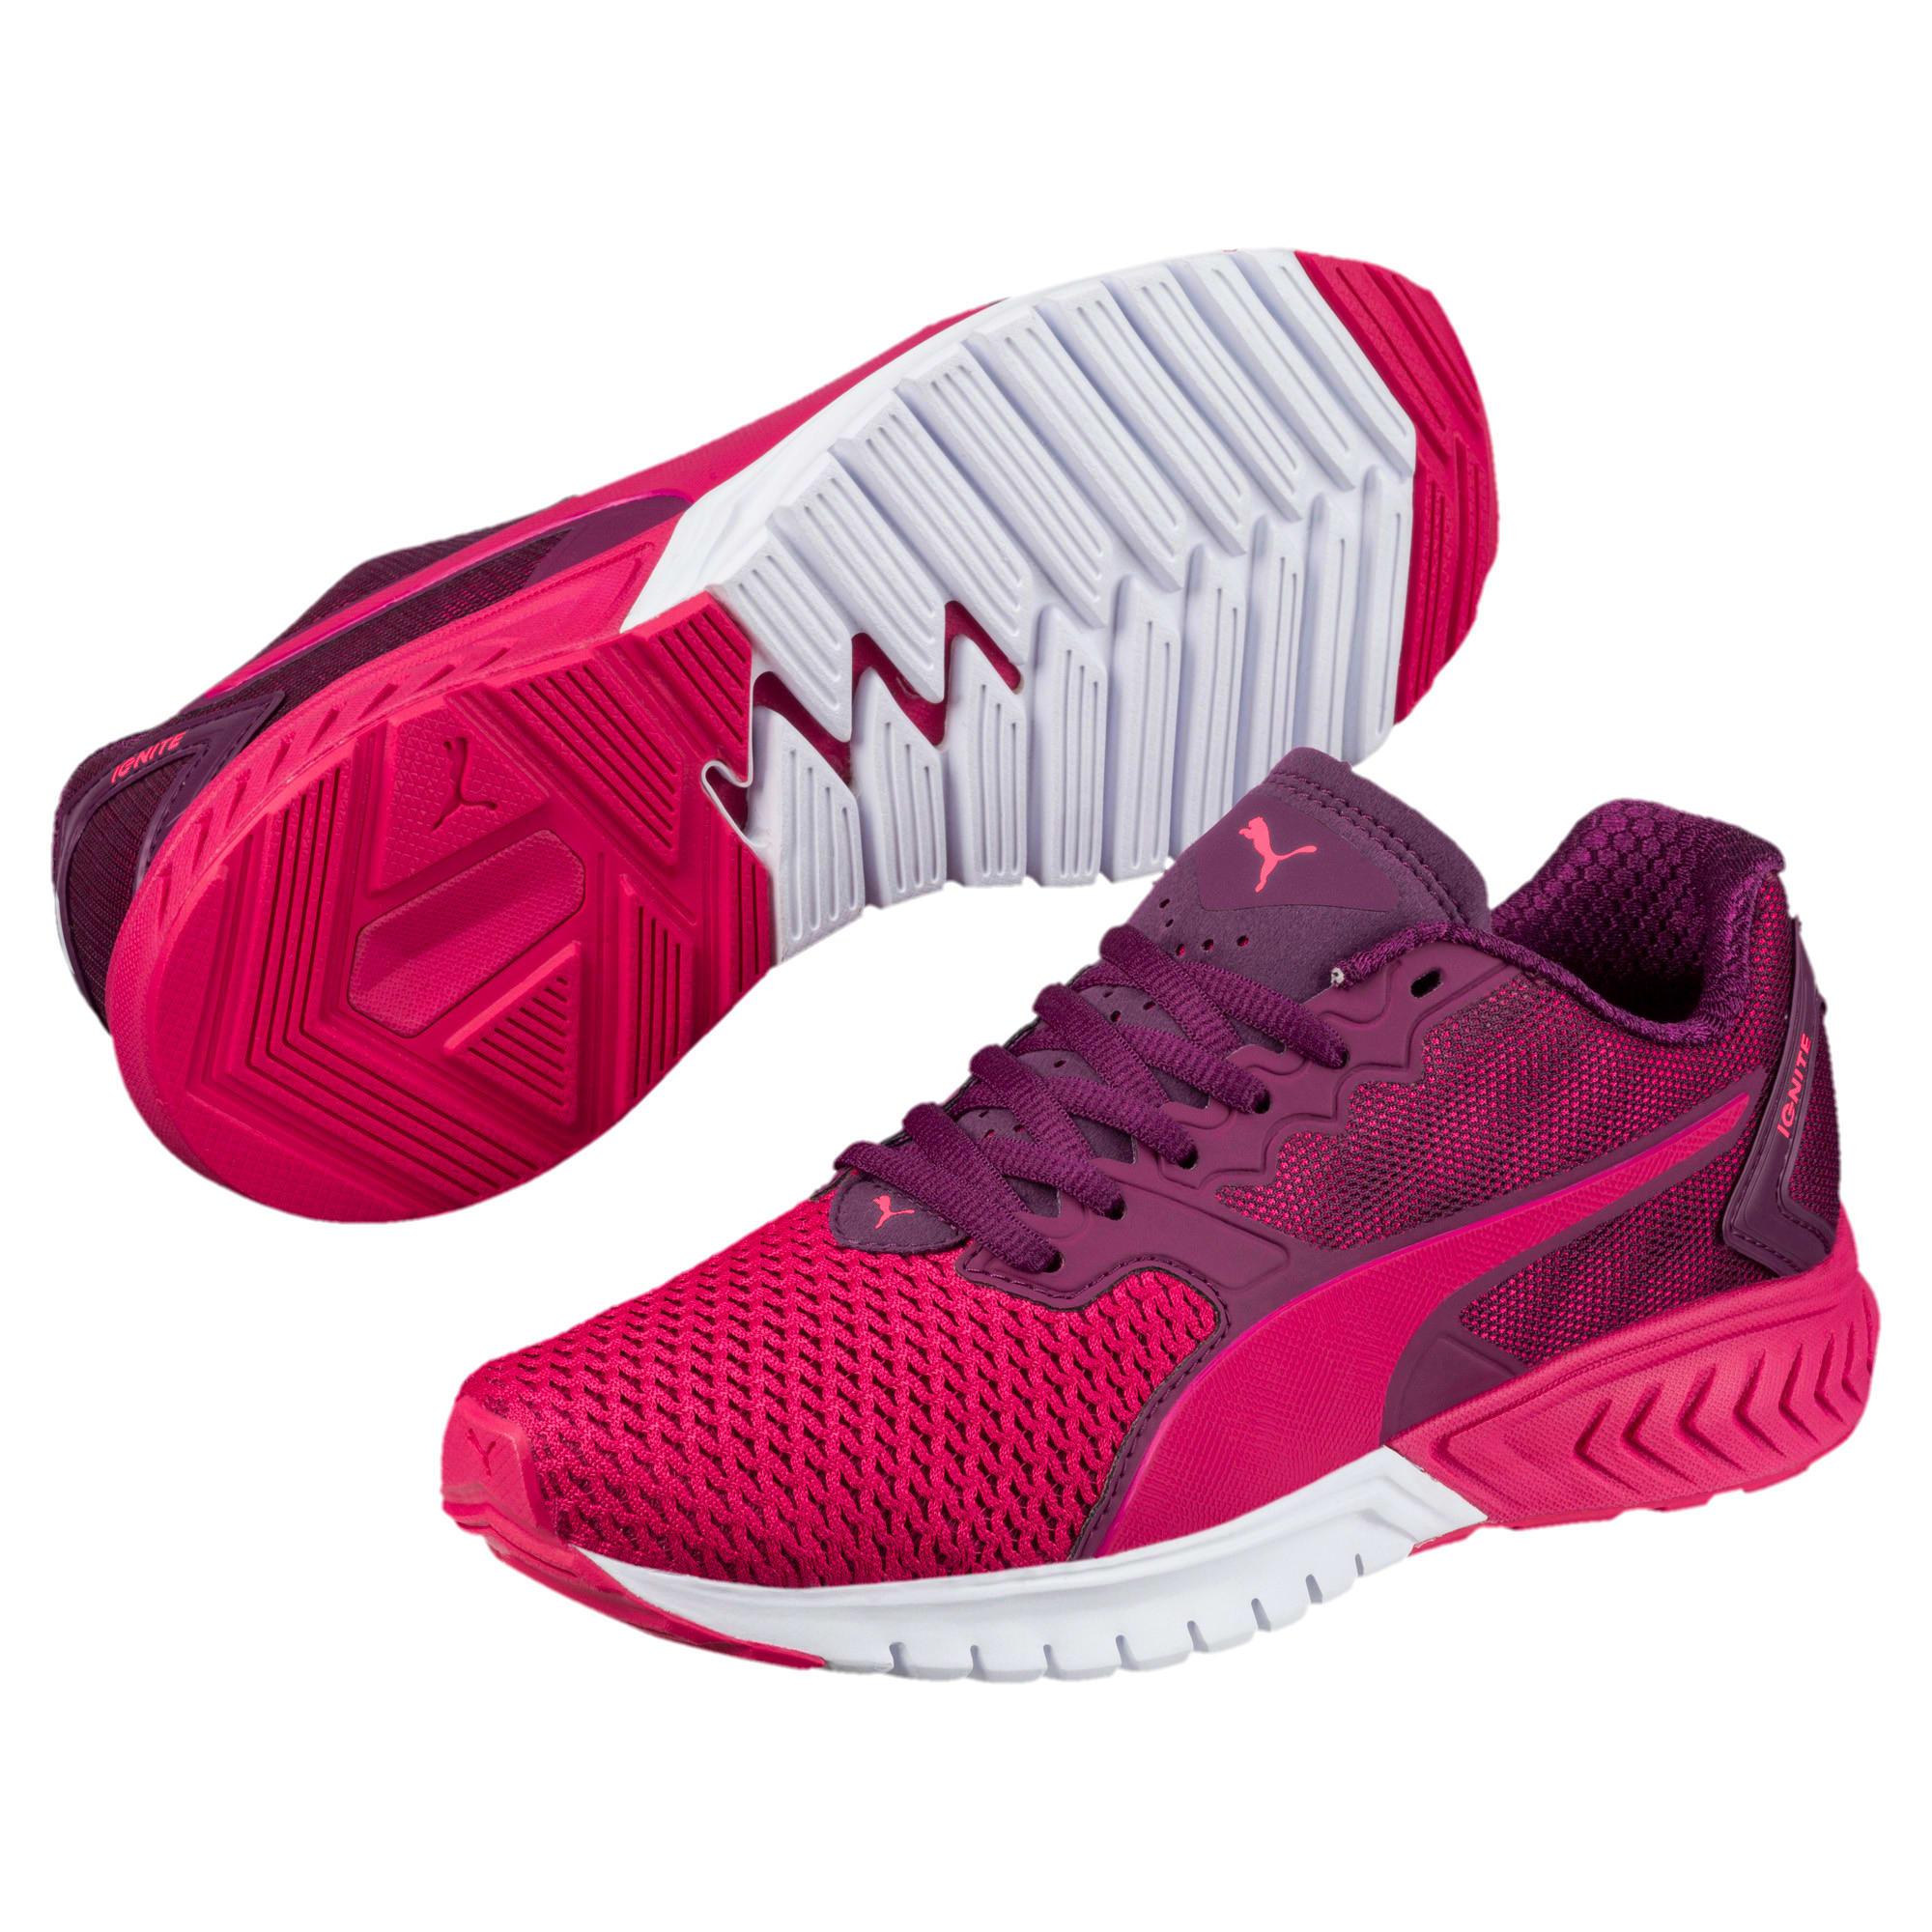 Thumbnail 2 of IGNITE Dual Mesh Kids' Running Shoes, Love Potion-Dark Purple, medium-IND